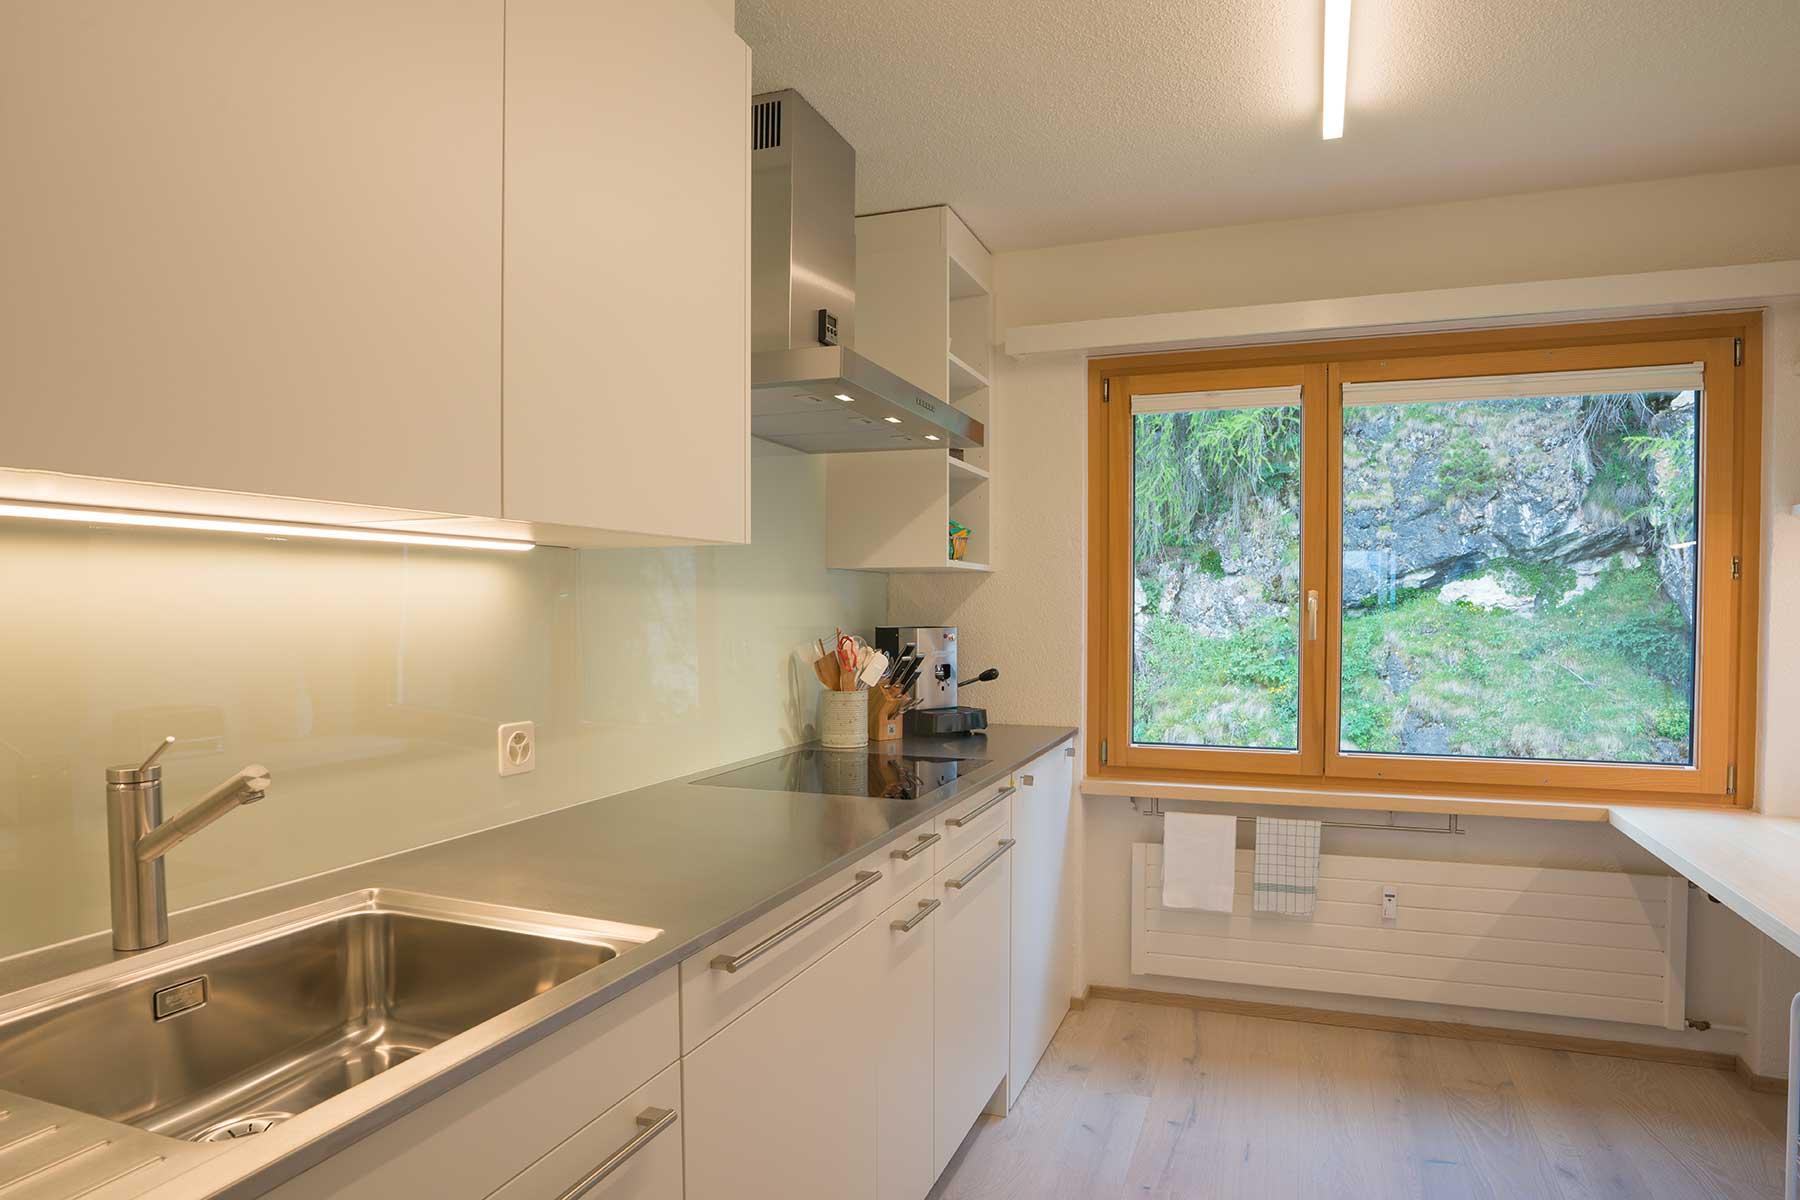 corinne wieland selected holiday homes – Chesa Maria